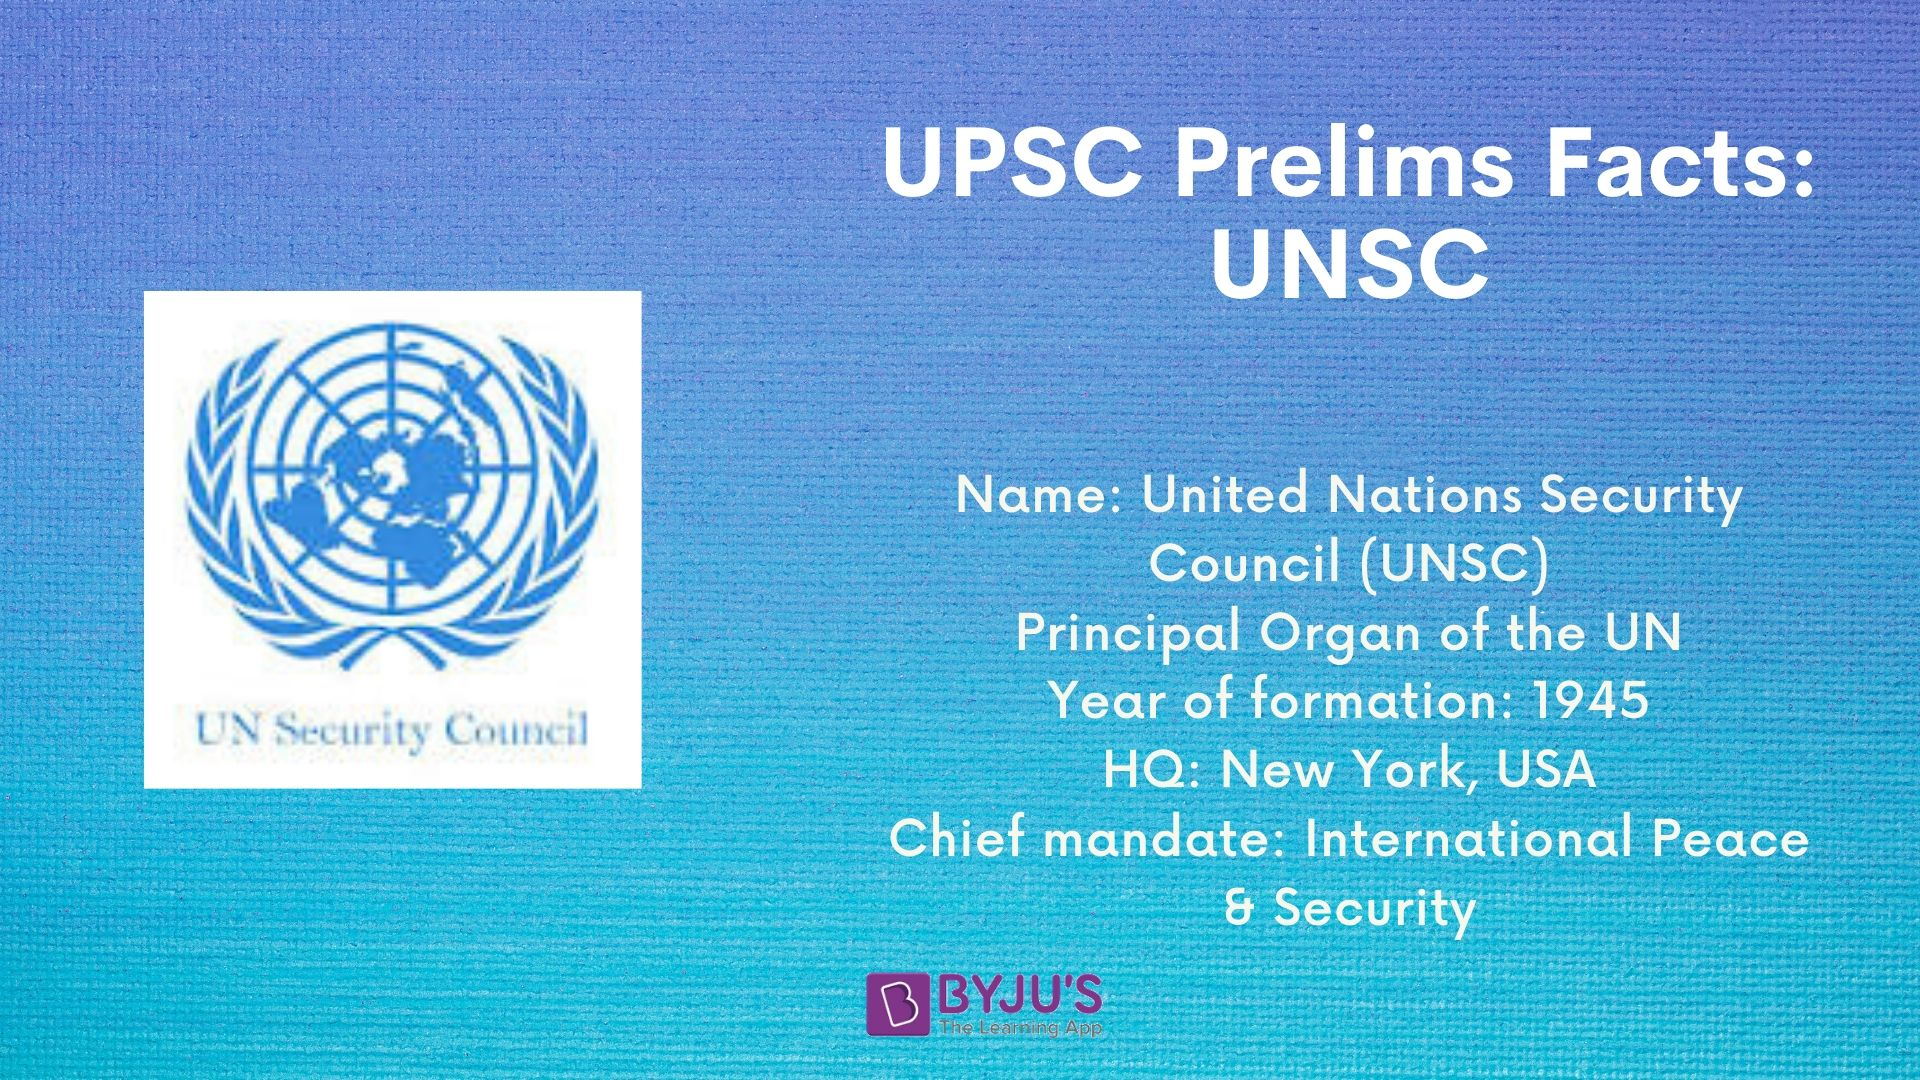 UPSC Prelims Facts - UNSC